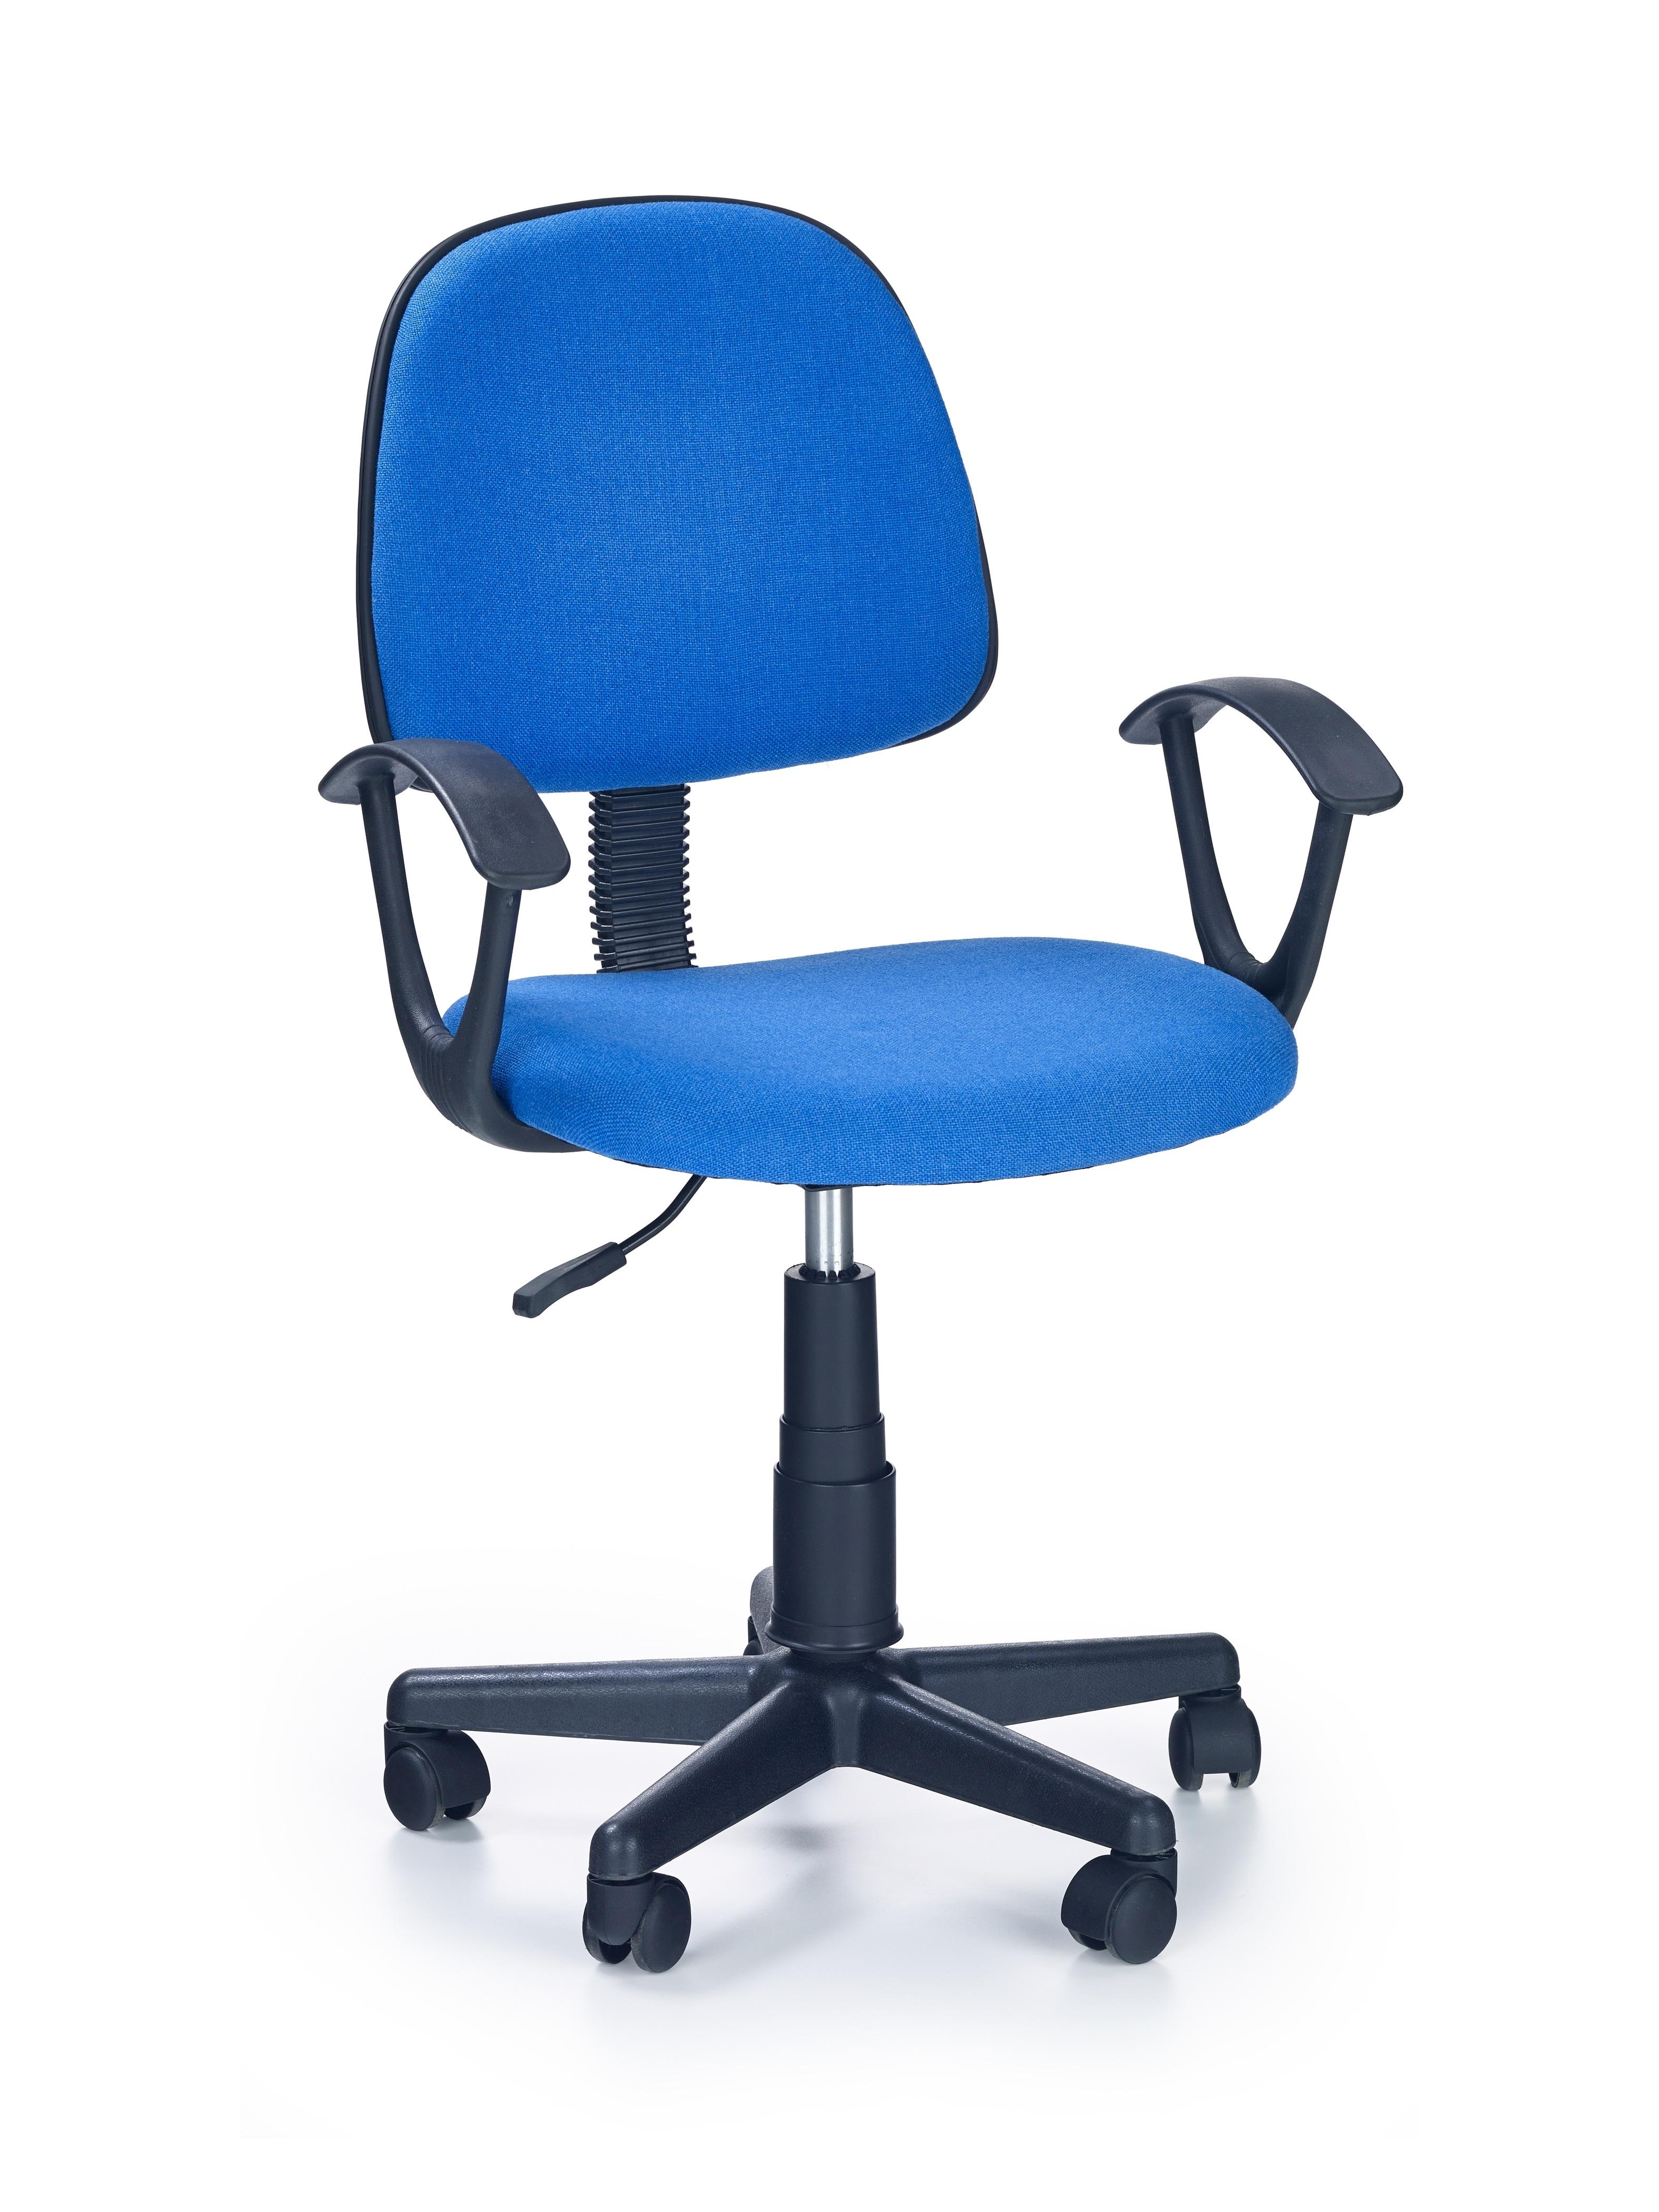 Scaun de birou pentru copii, tapitat cu stofa Darian Bis Blue, l56xA53xH84-95 cm poza